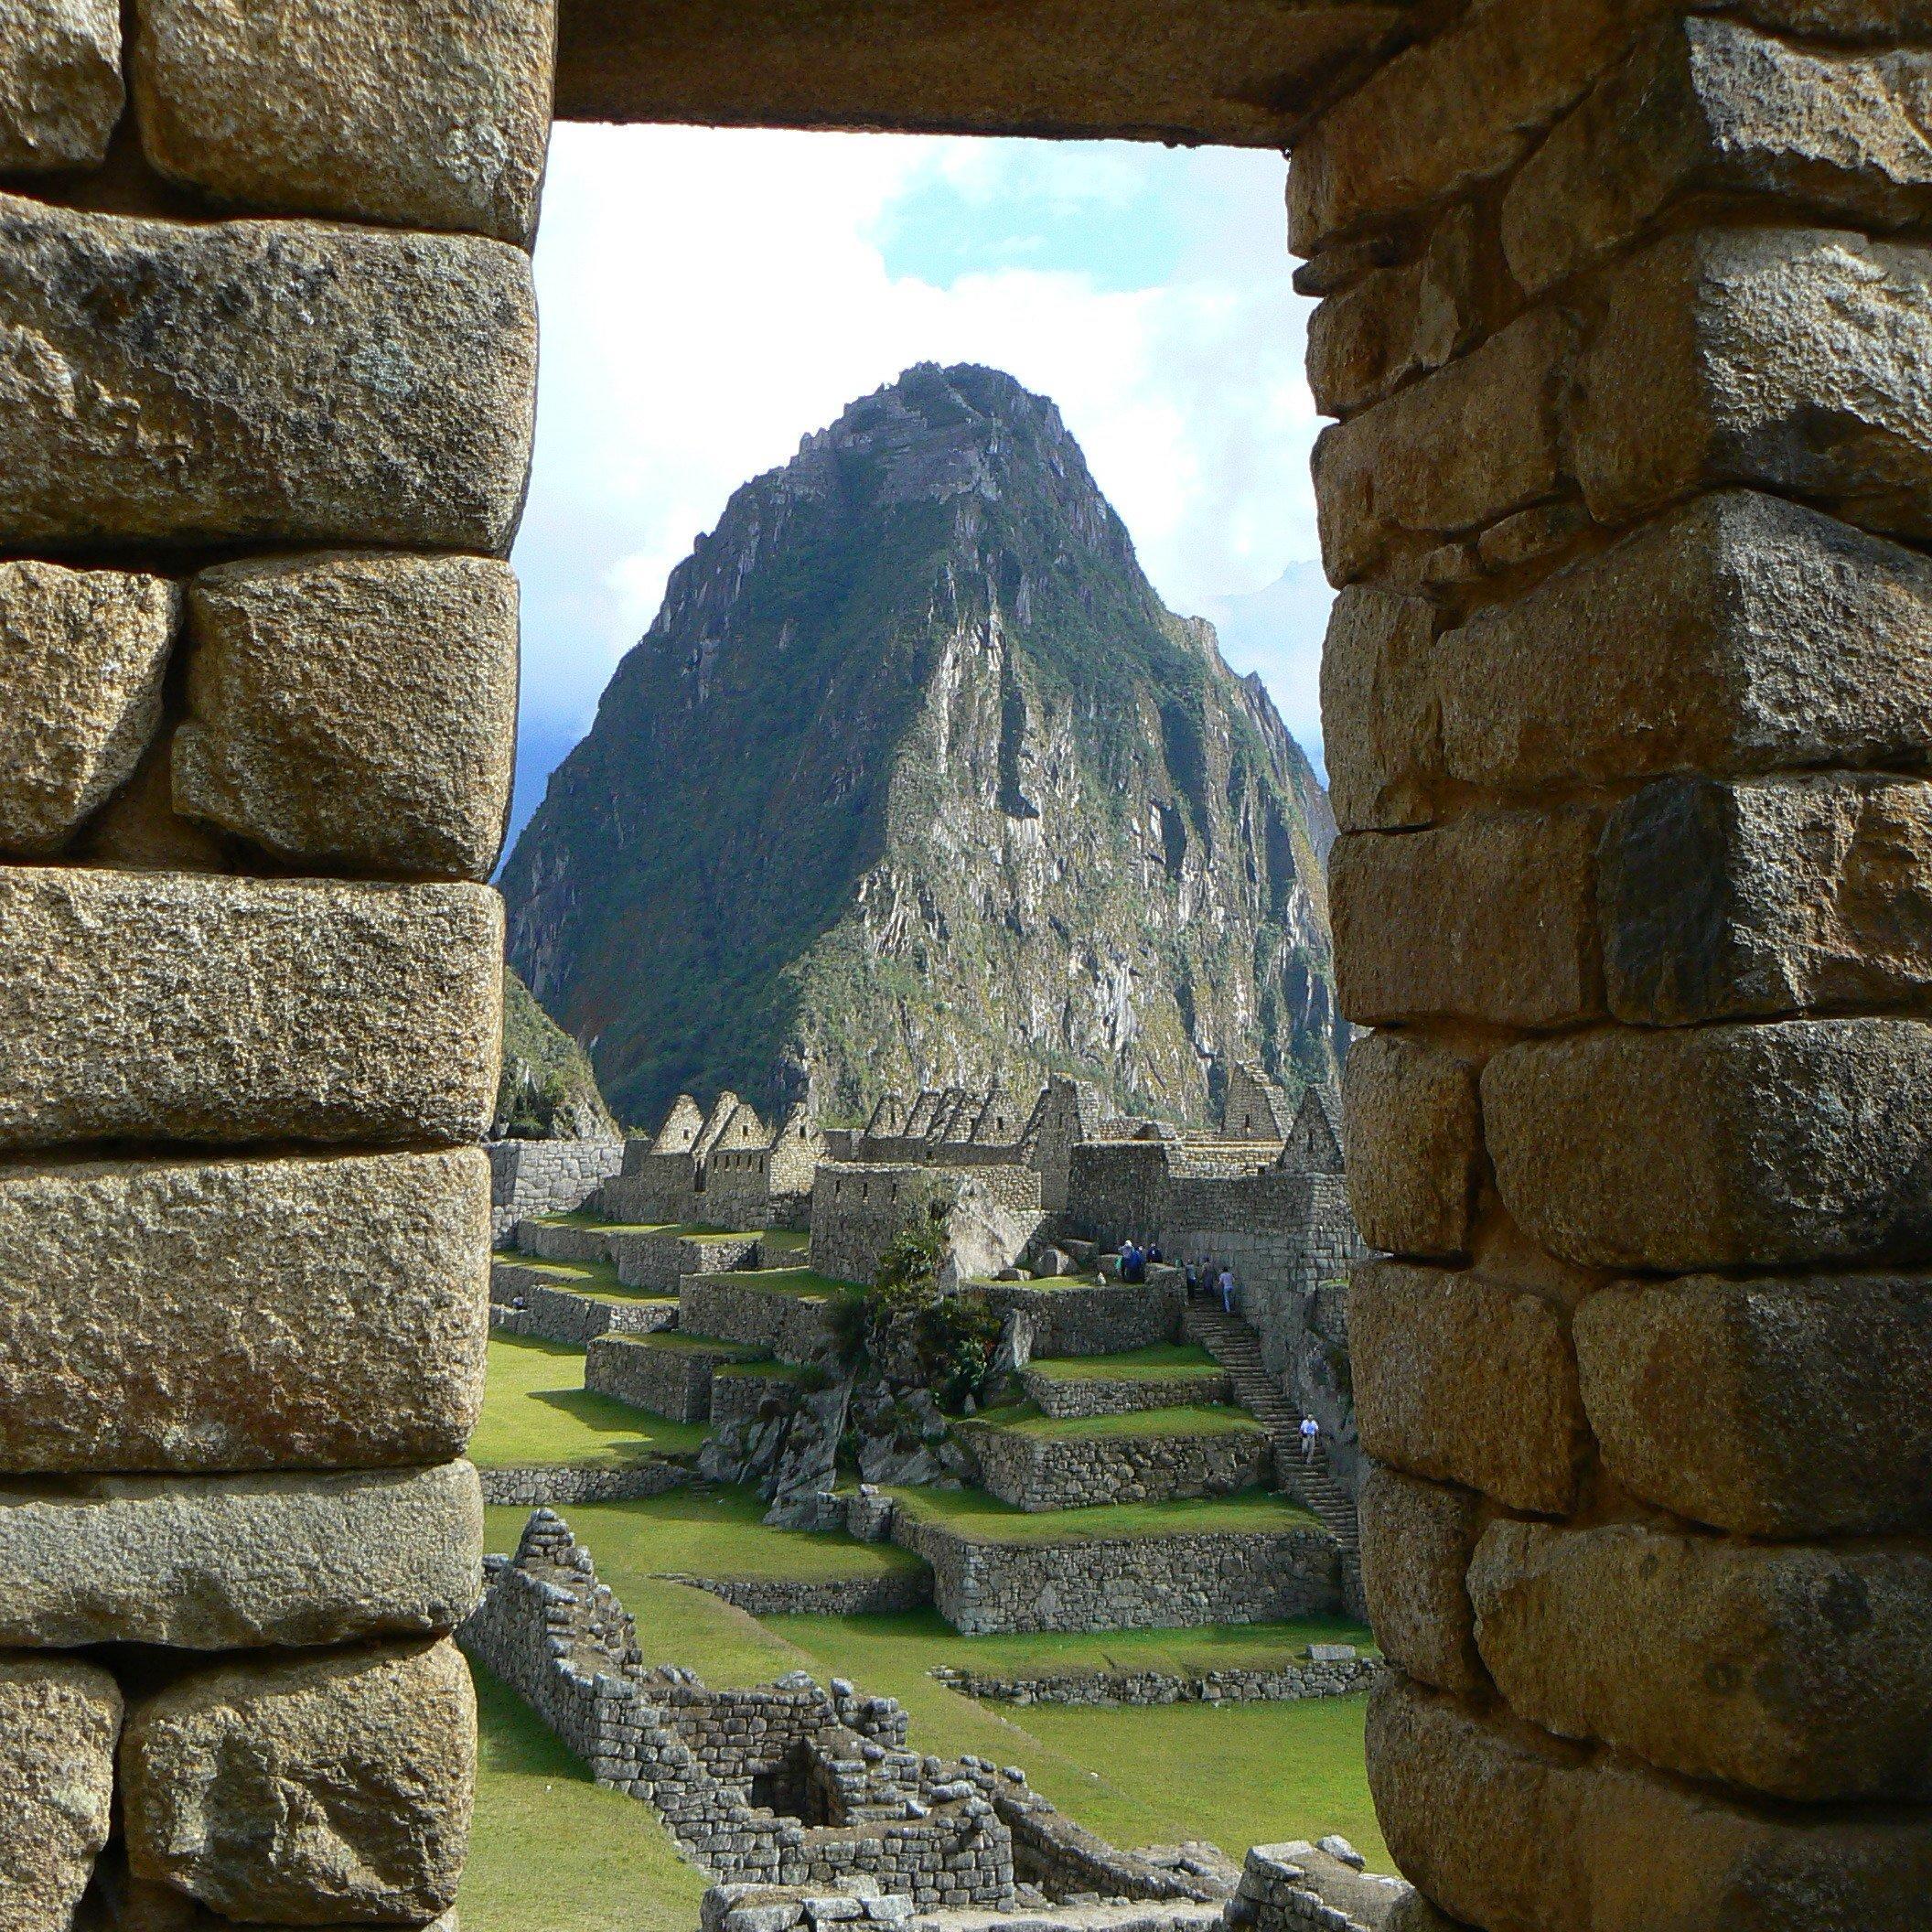 View of Huayna Picchu from a Machu Picchu doorway